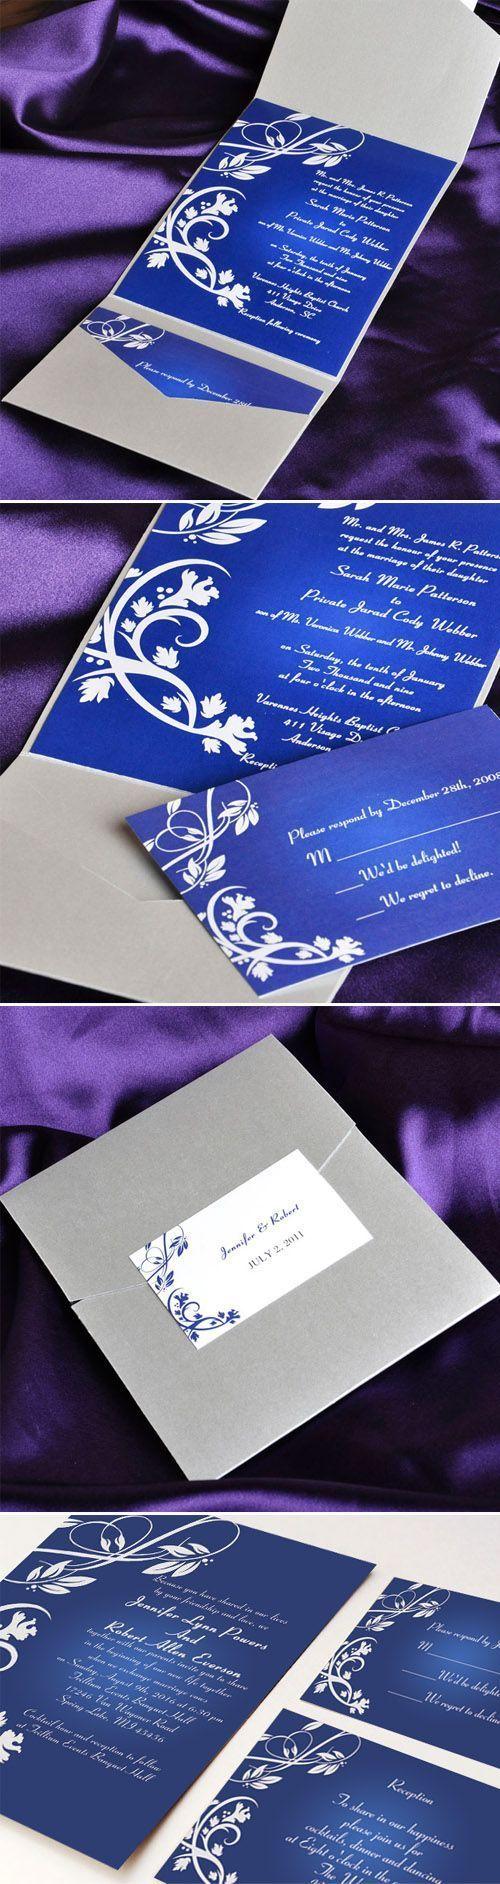 royal blue and grey pocket elegant wedding